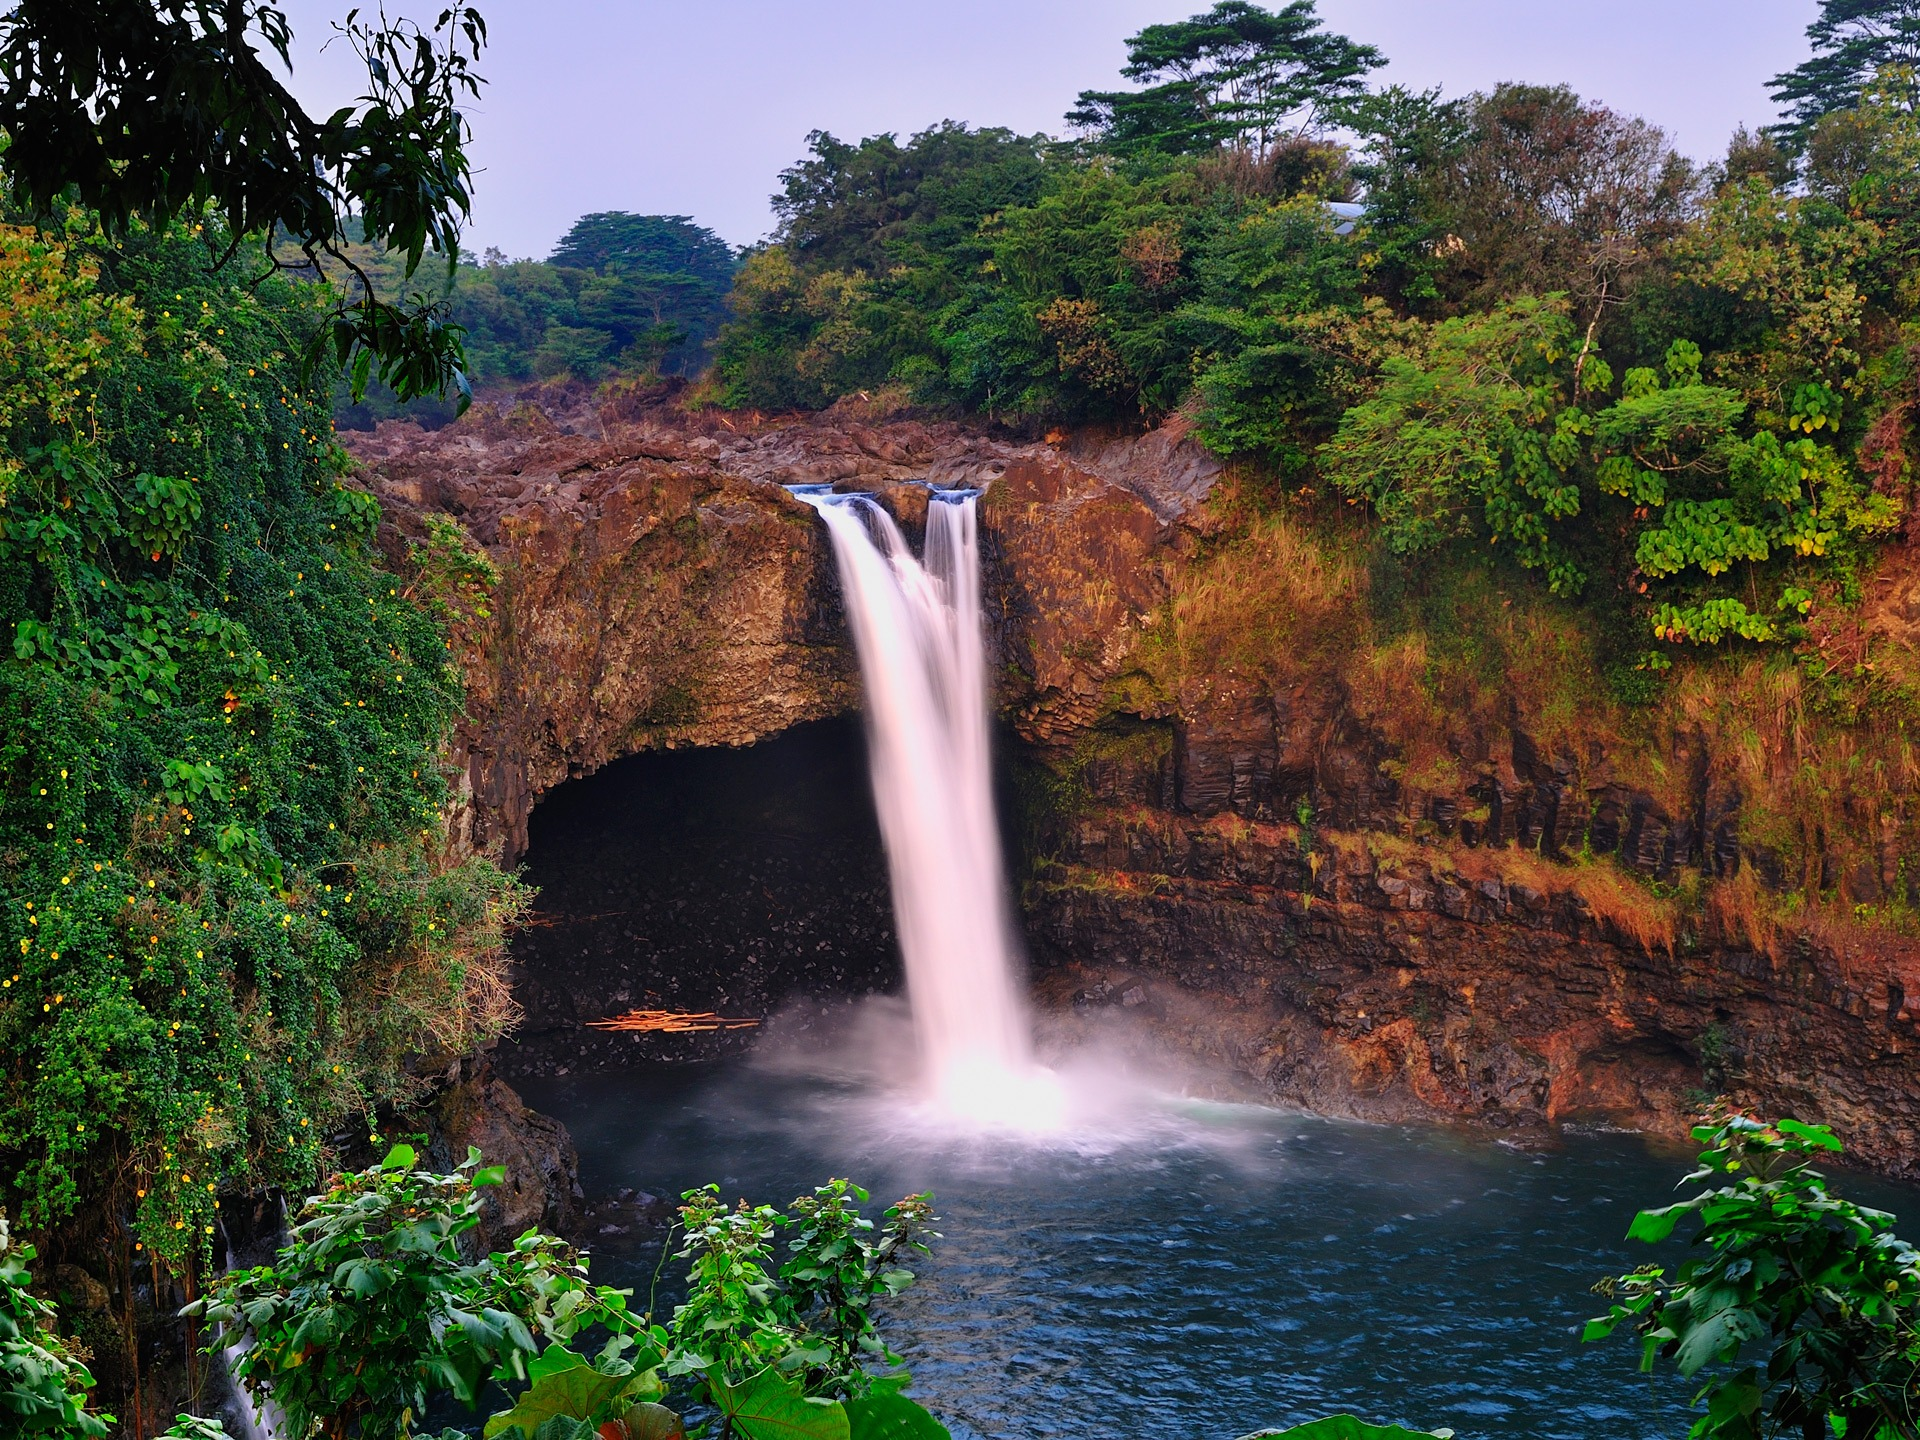 Rainbow falls wallpaper waterfalls nature wallpapers in jpg format 16001200 19201440 1280800 voltagebd Gallery